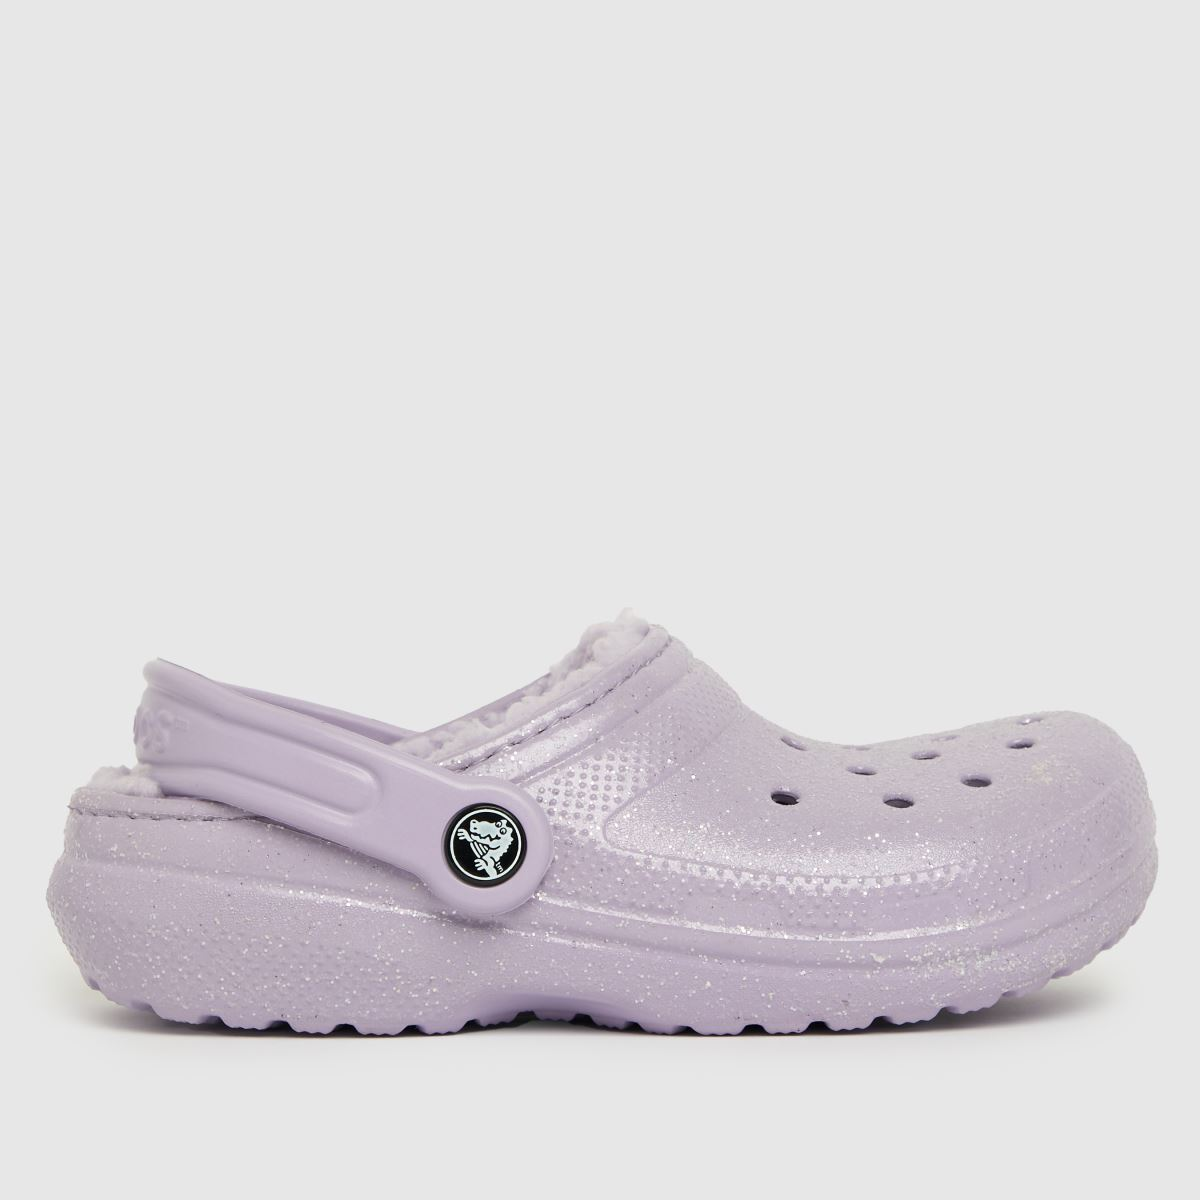 Crocs Lilac Classic Lined Glitter Trainers Junior